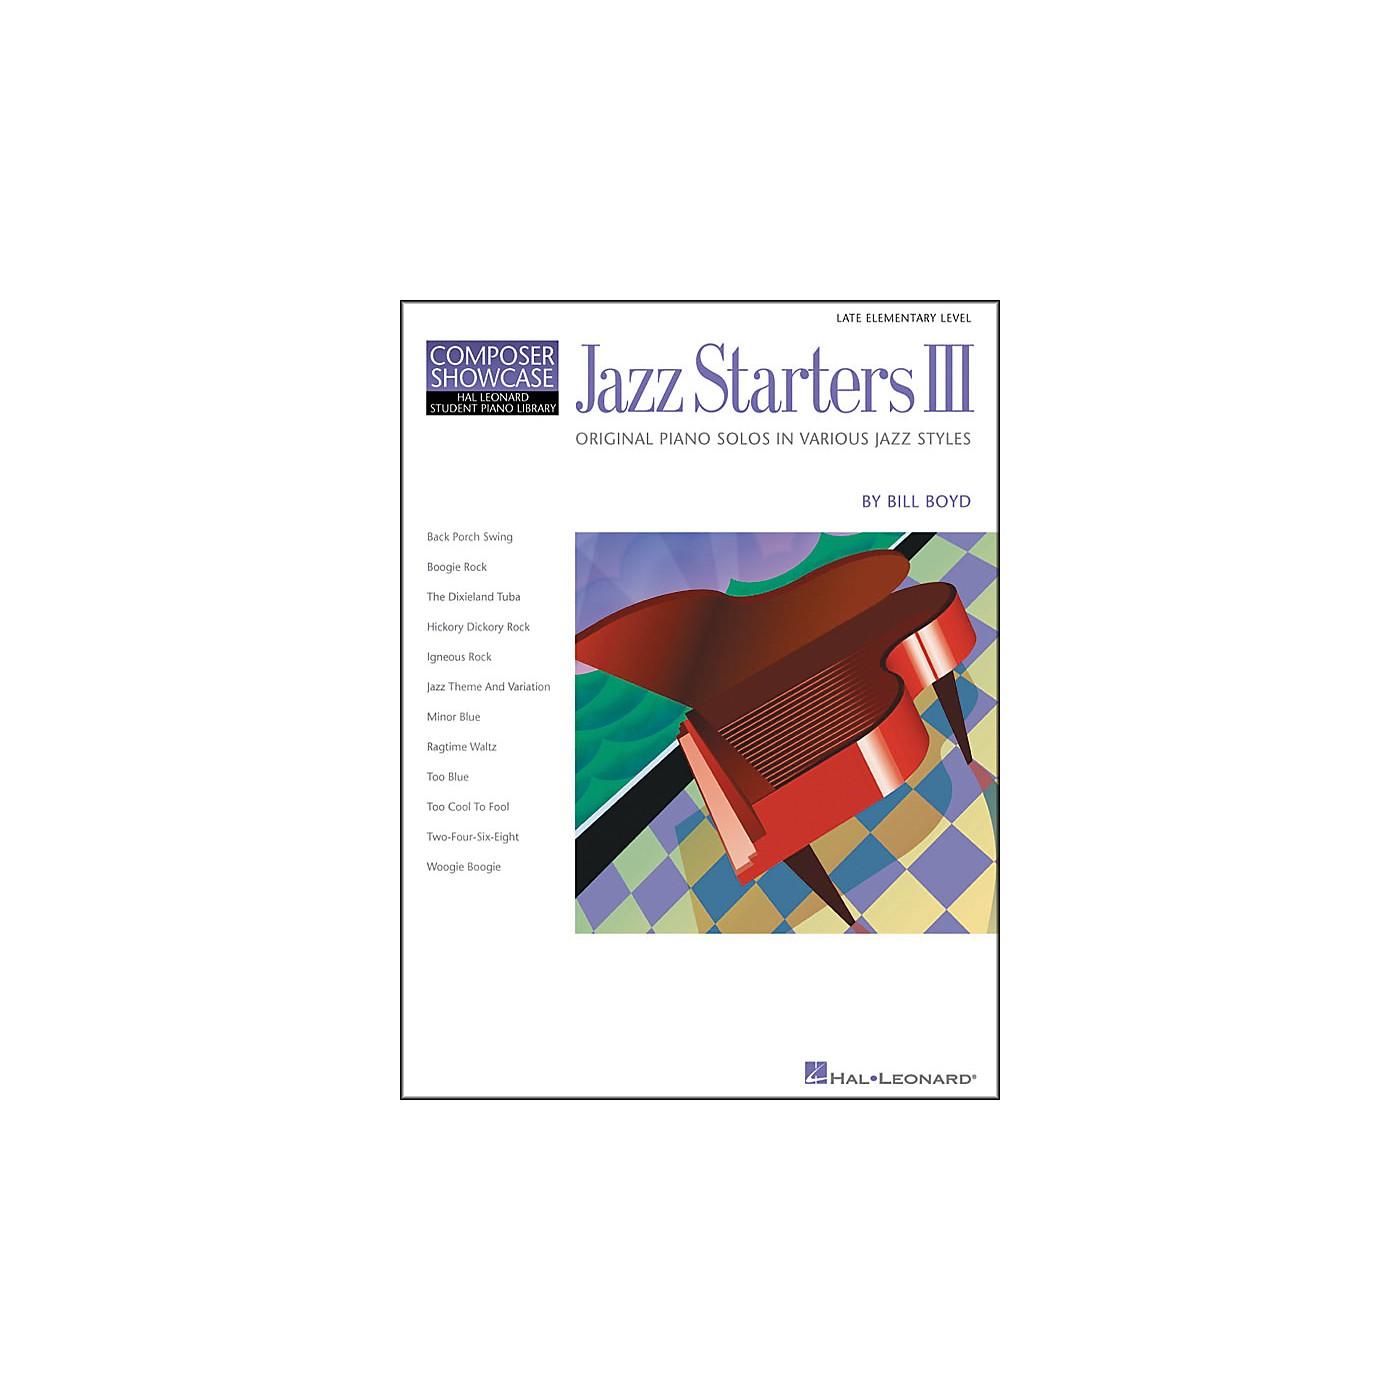 Hal Leonard Jazz Starters III Late Elementary Piano Solos Hal Leonard Student Piano Library by Bill Boyd thumbnail